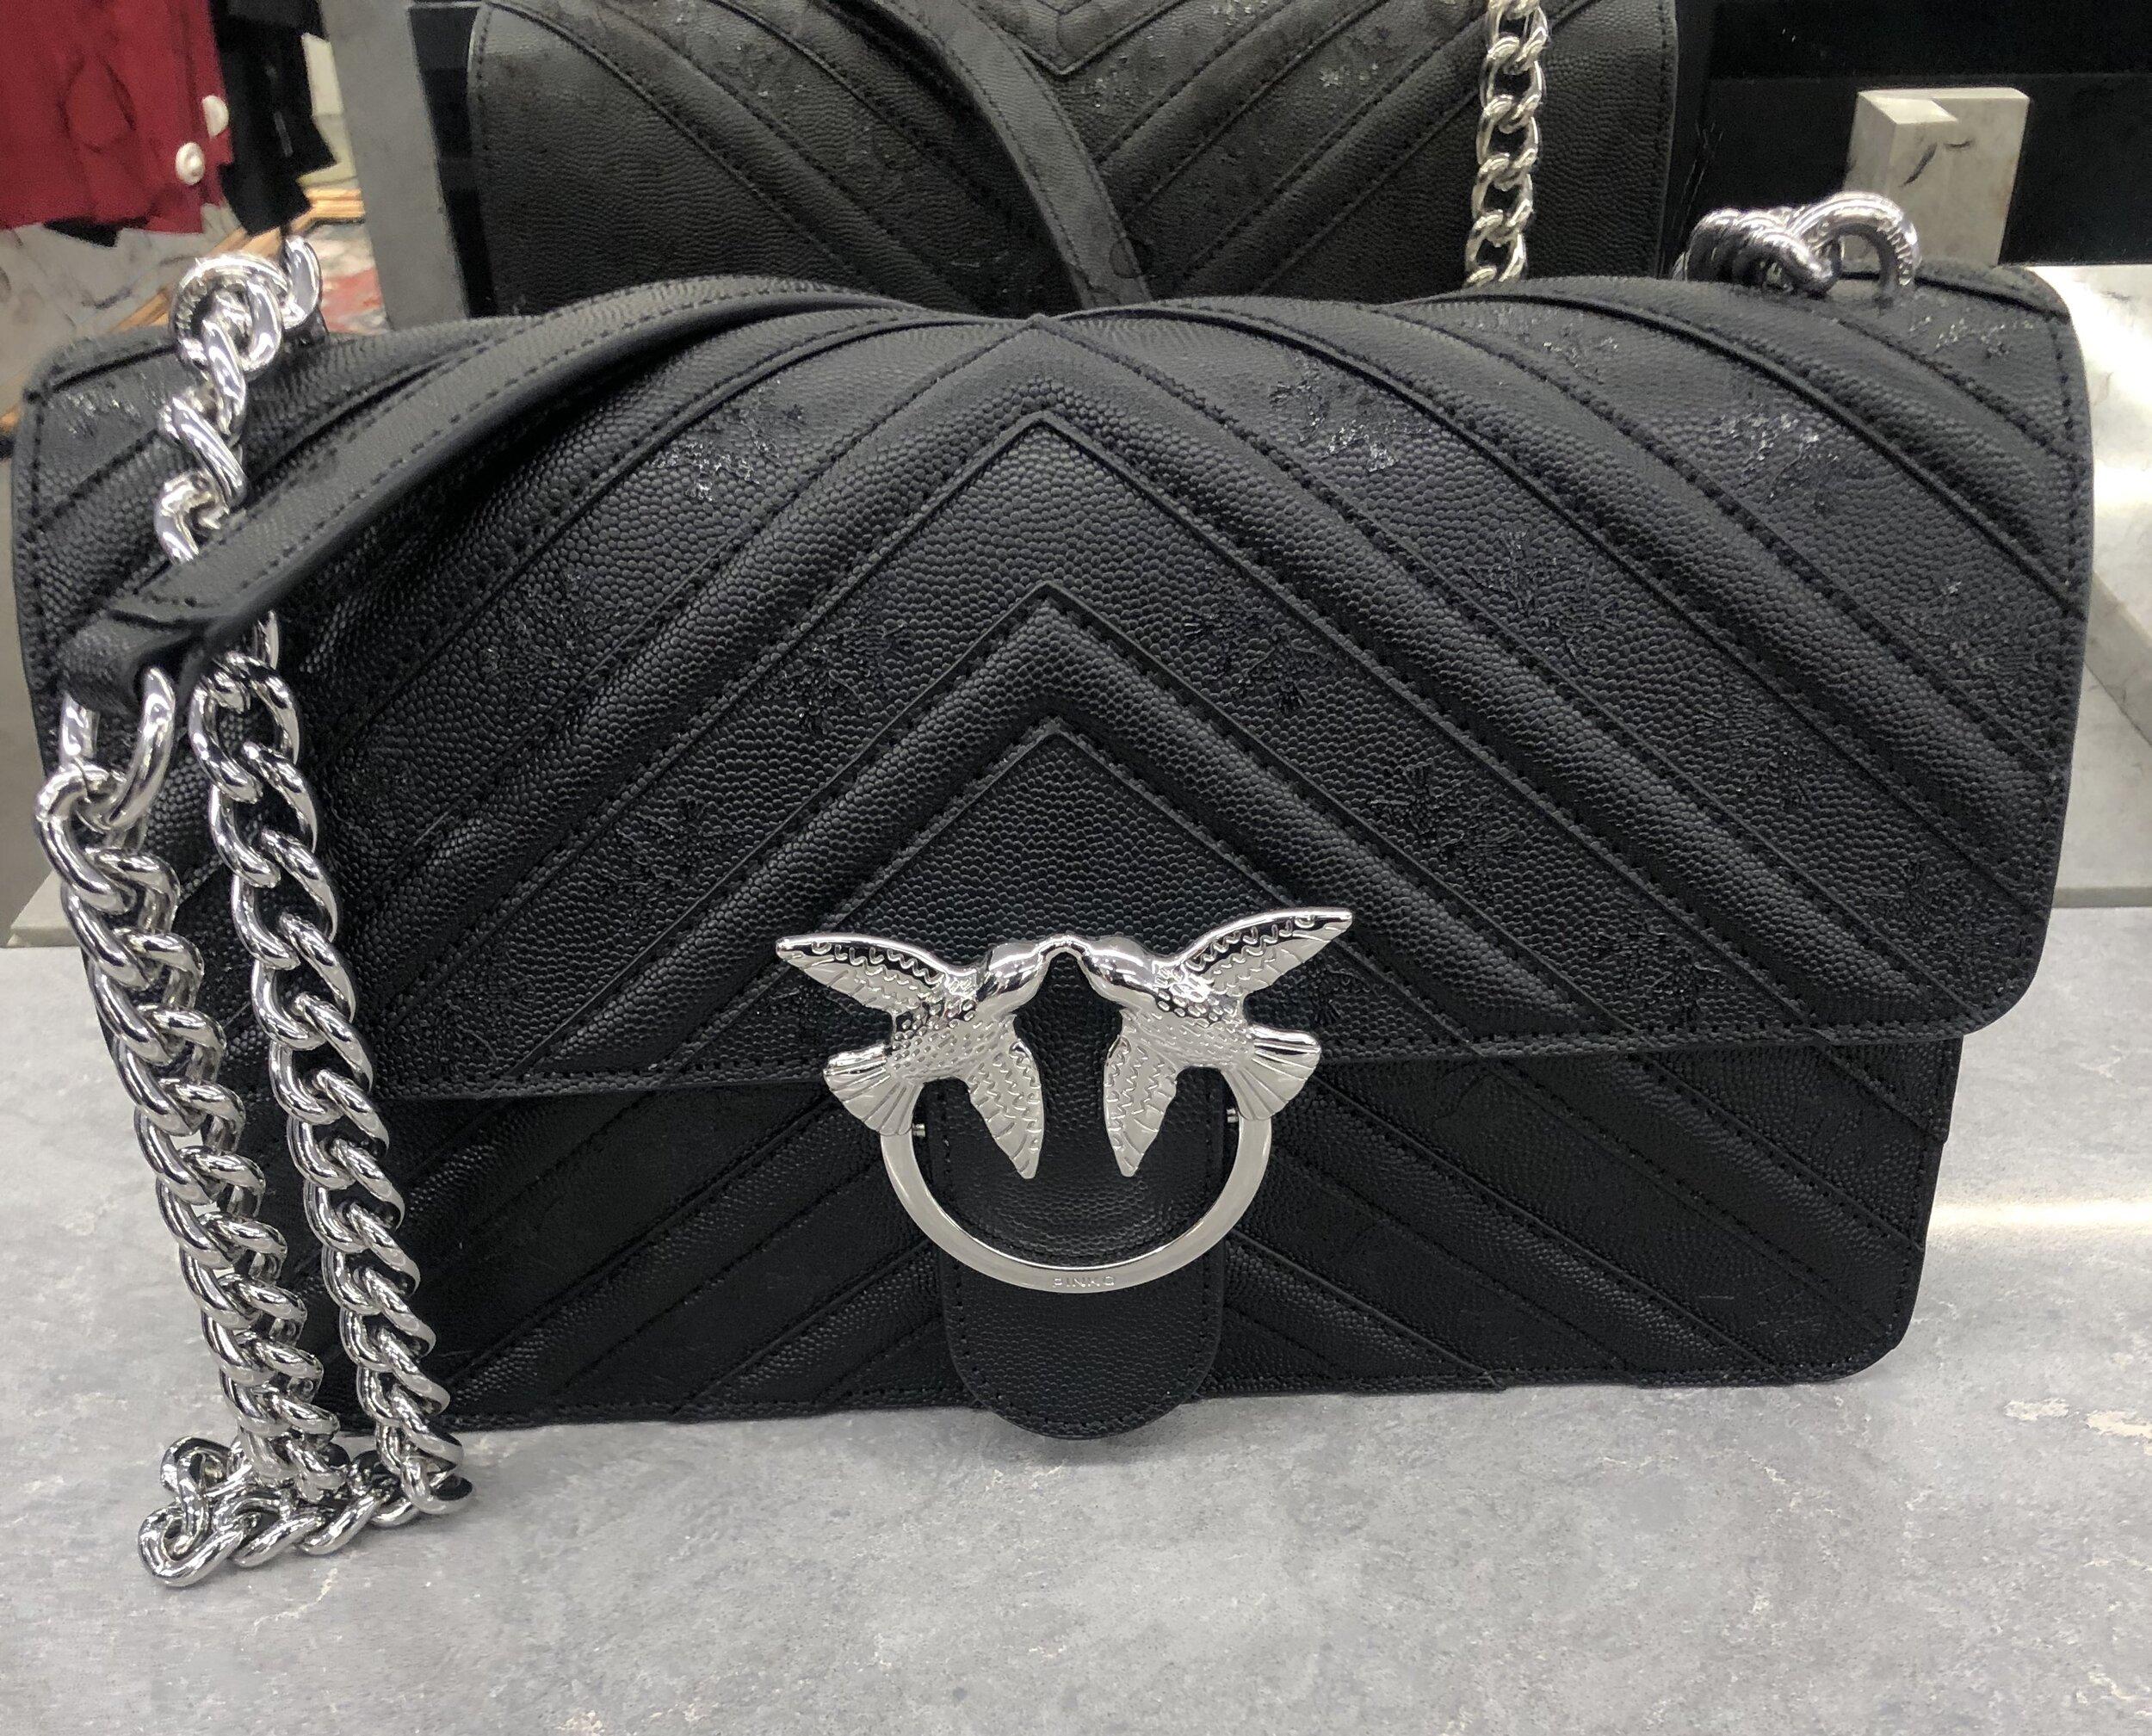 Pinko Bag: $575, sale $250, Pinko.com